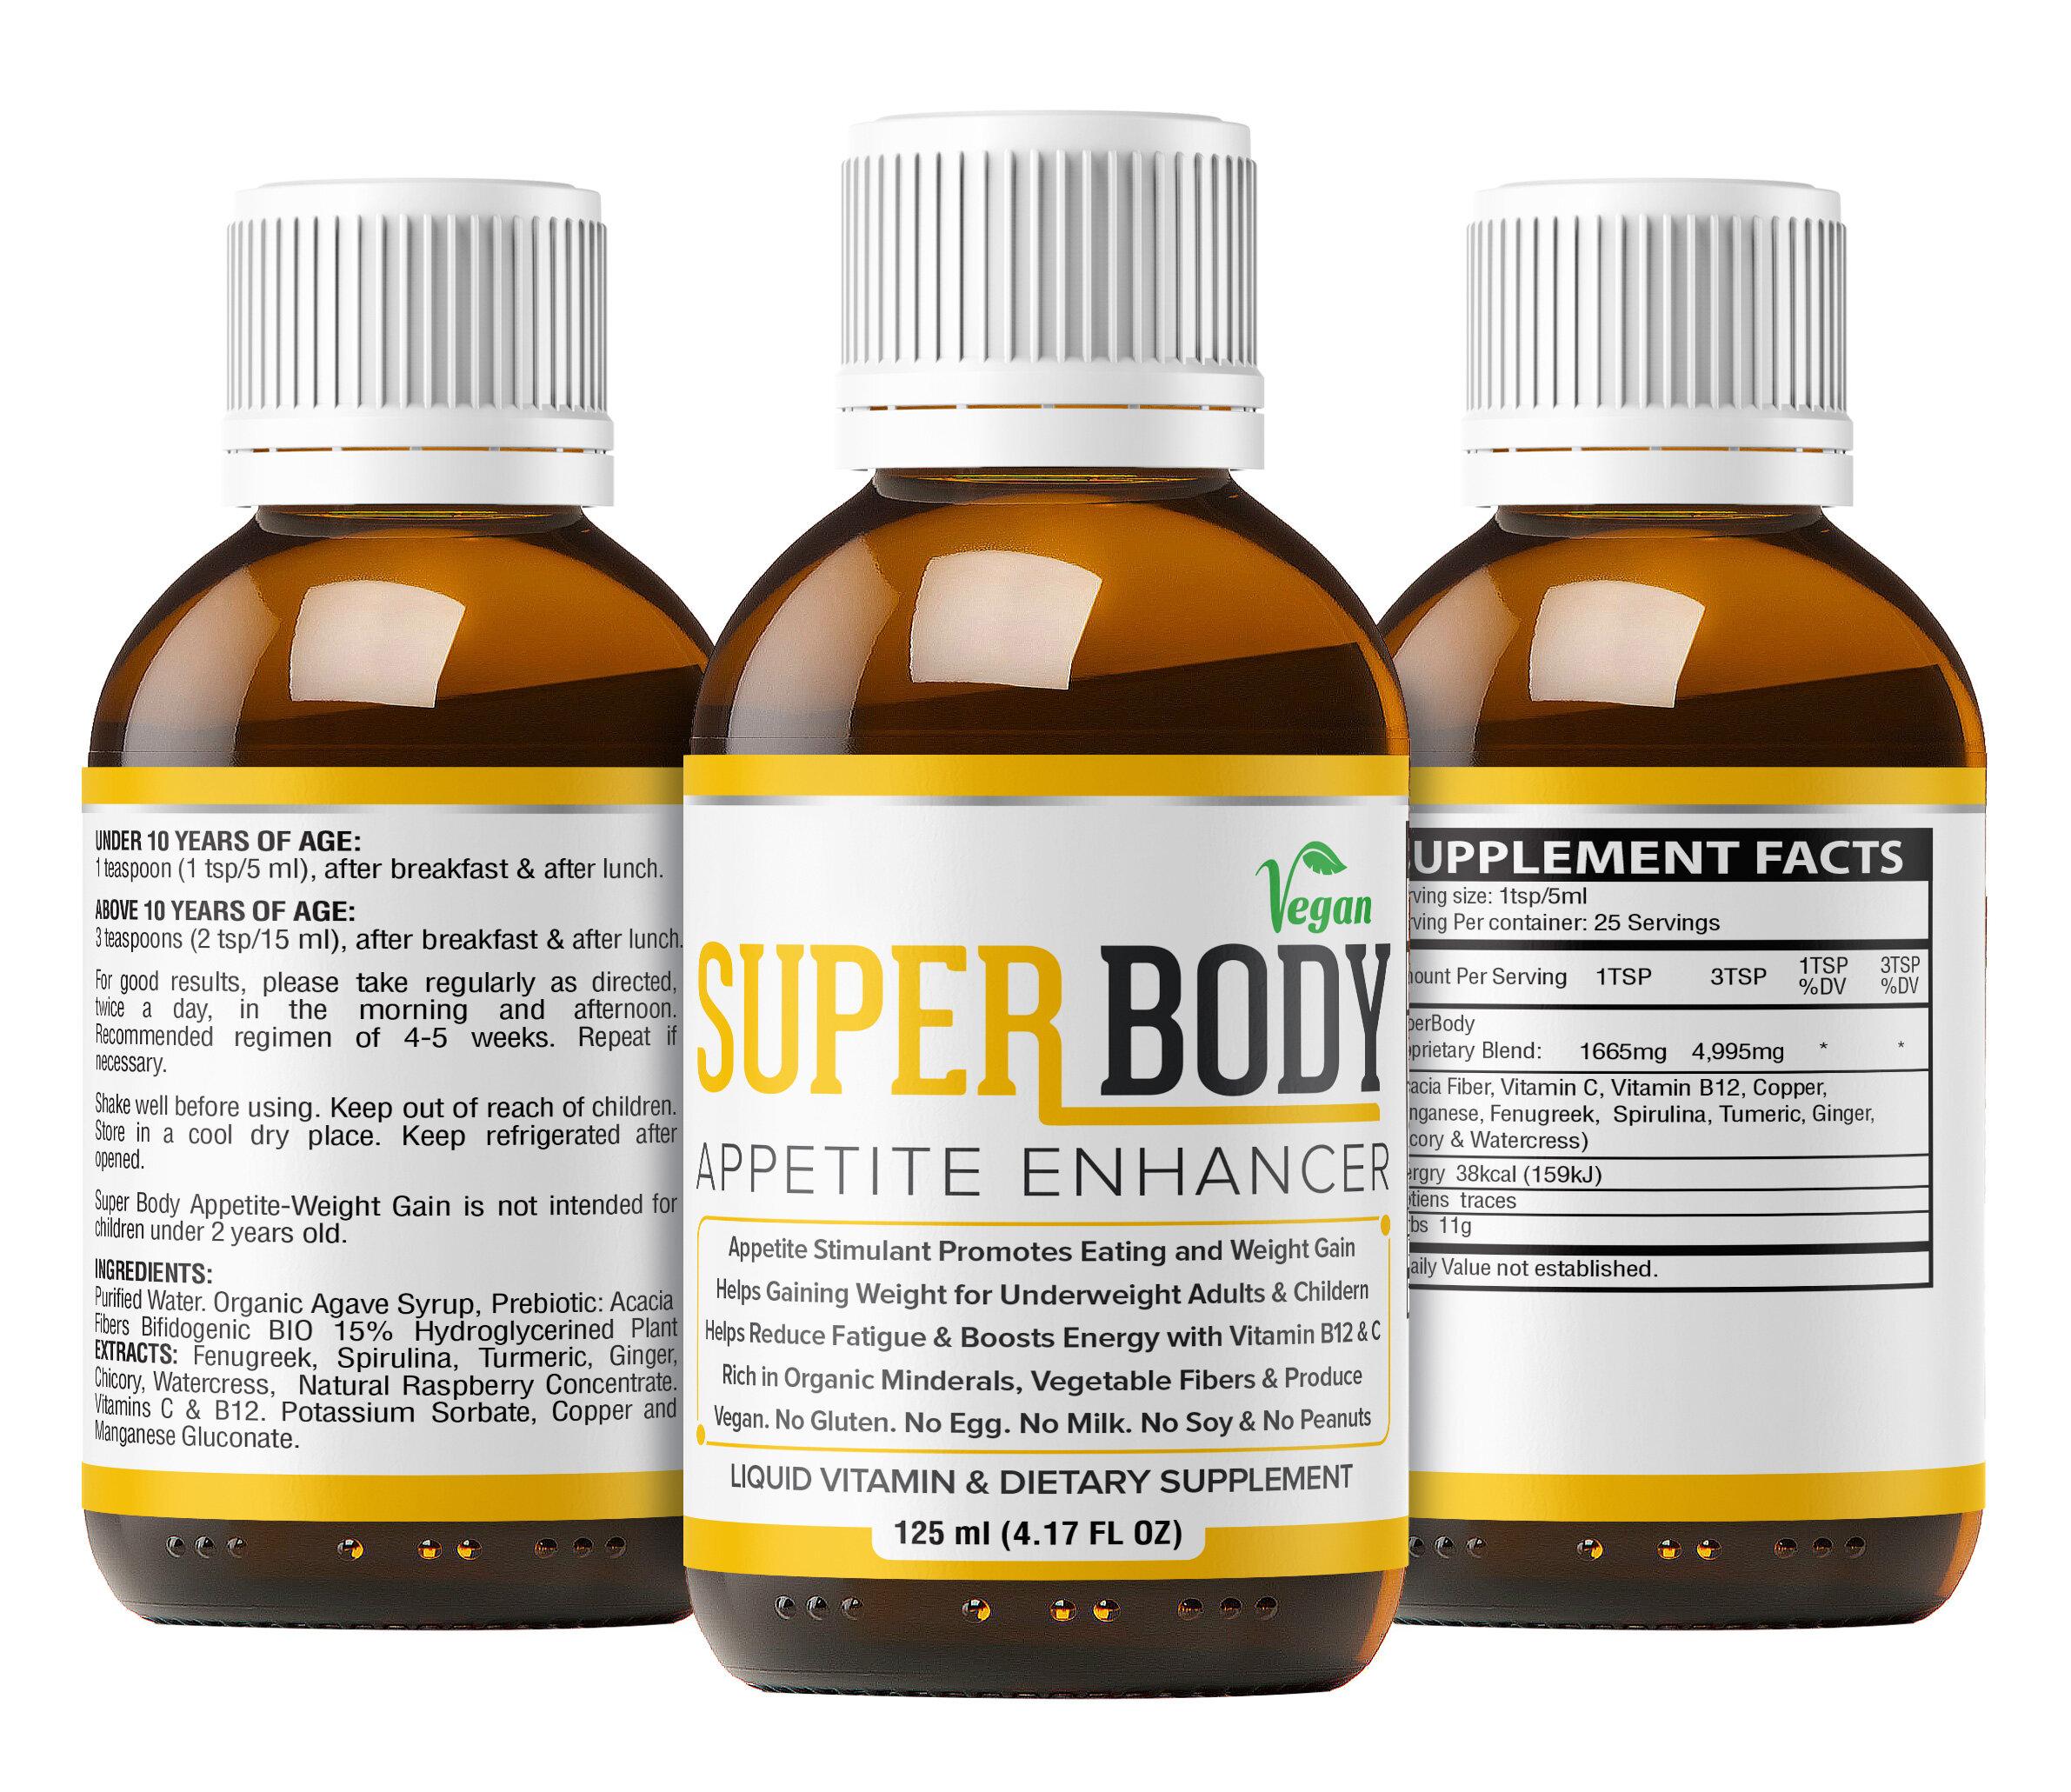 Weight Gain Supplements Eatup Appetite Enhancer